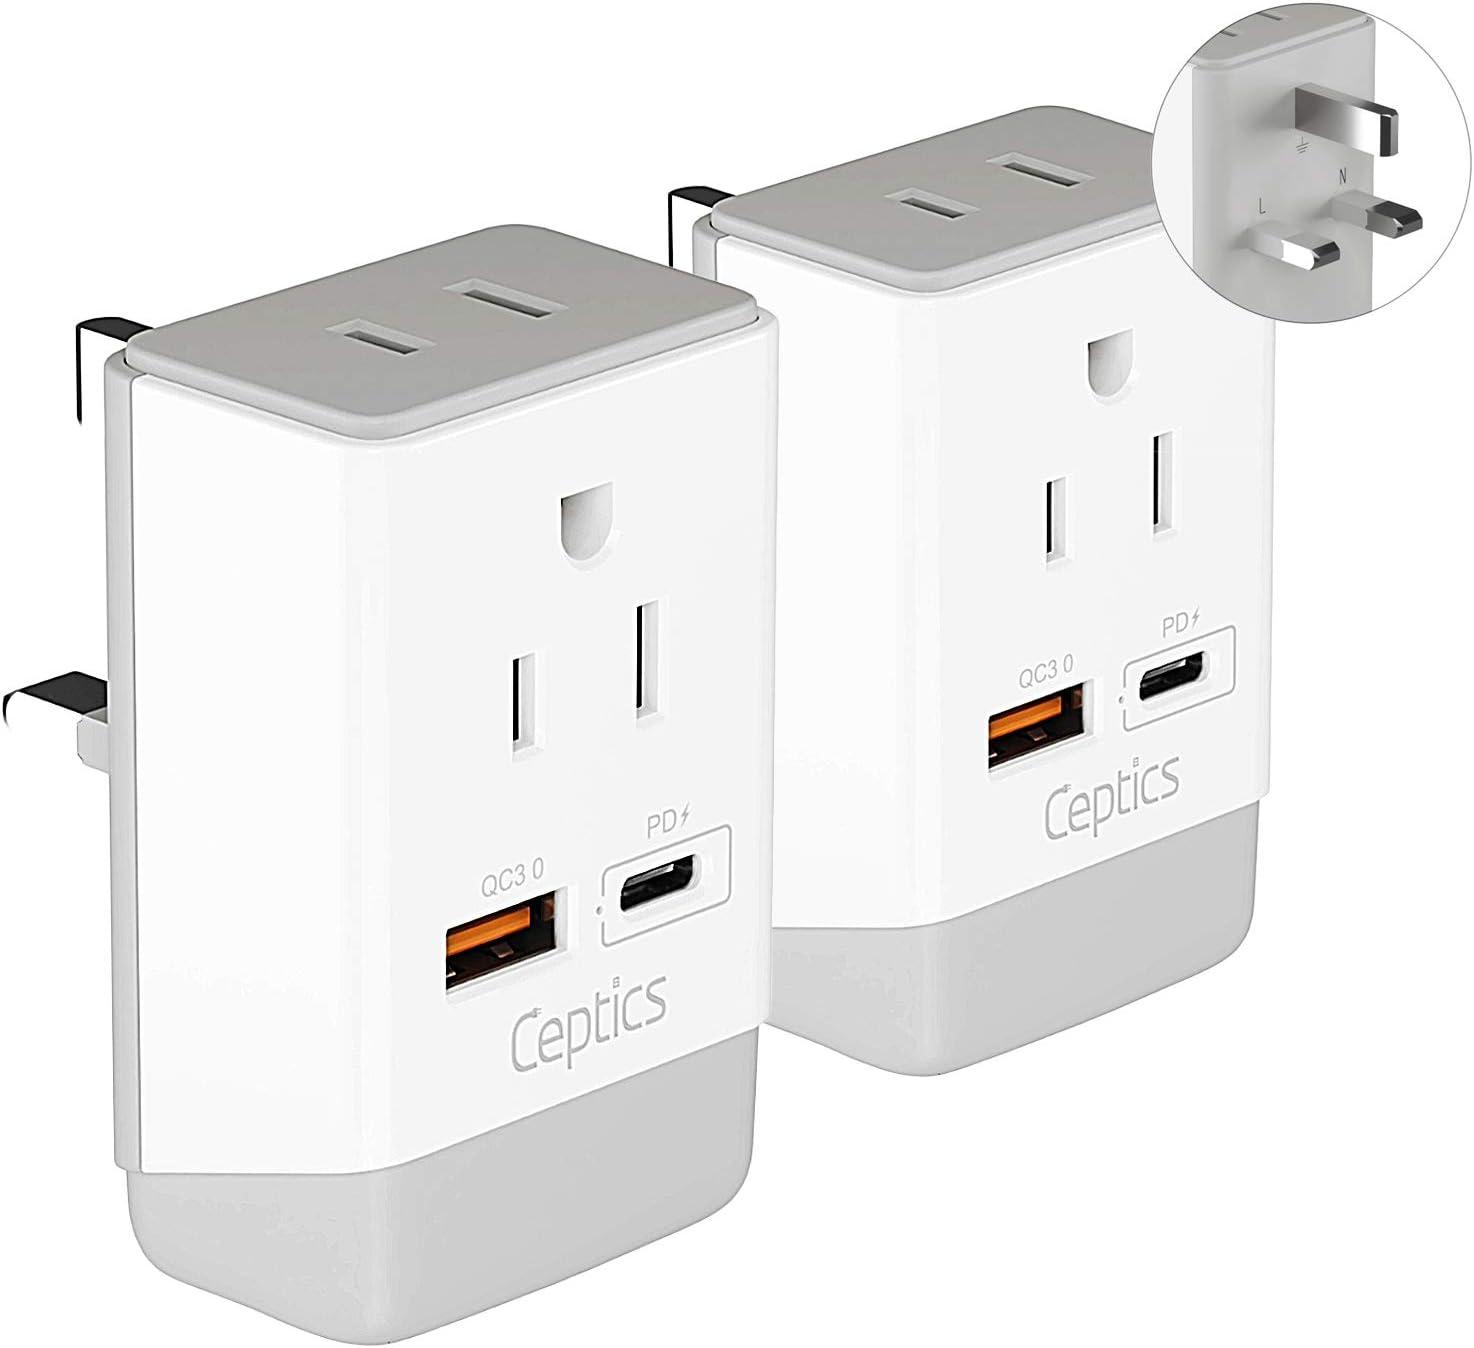 UK Ireland Power Plug Adapter 2 Pack Set, QC 3.0 & PD by Ceptics, Safe Dual USB & USB-C - 2 USA Socket Compact & Powerful - Use in London UAE Dubai Kenya British Hong Kong Type G AP-7 Fast Charging